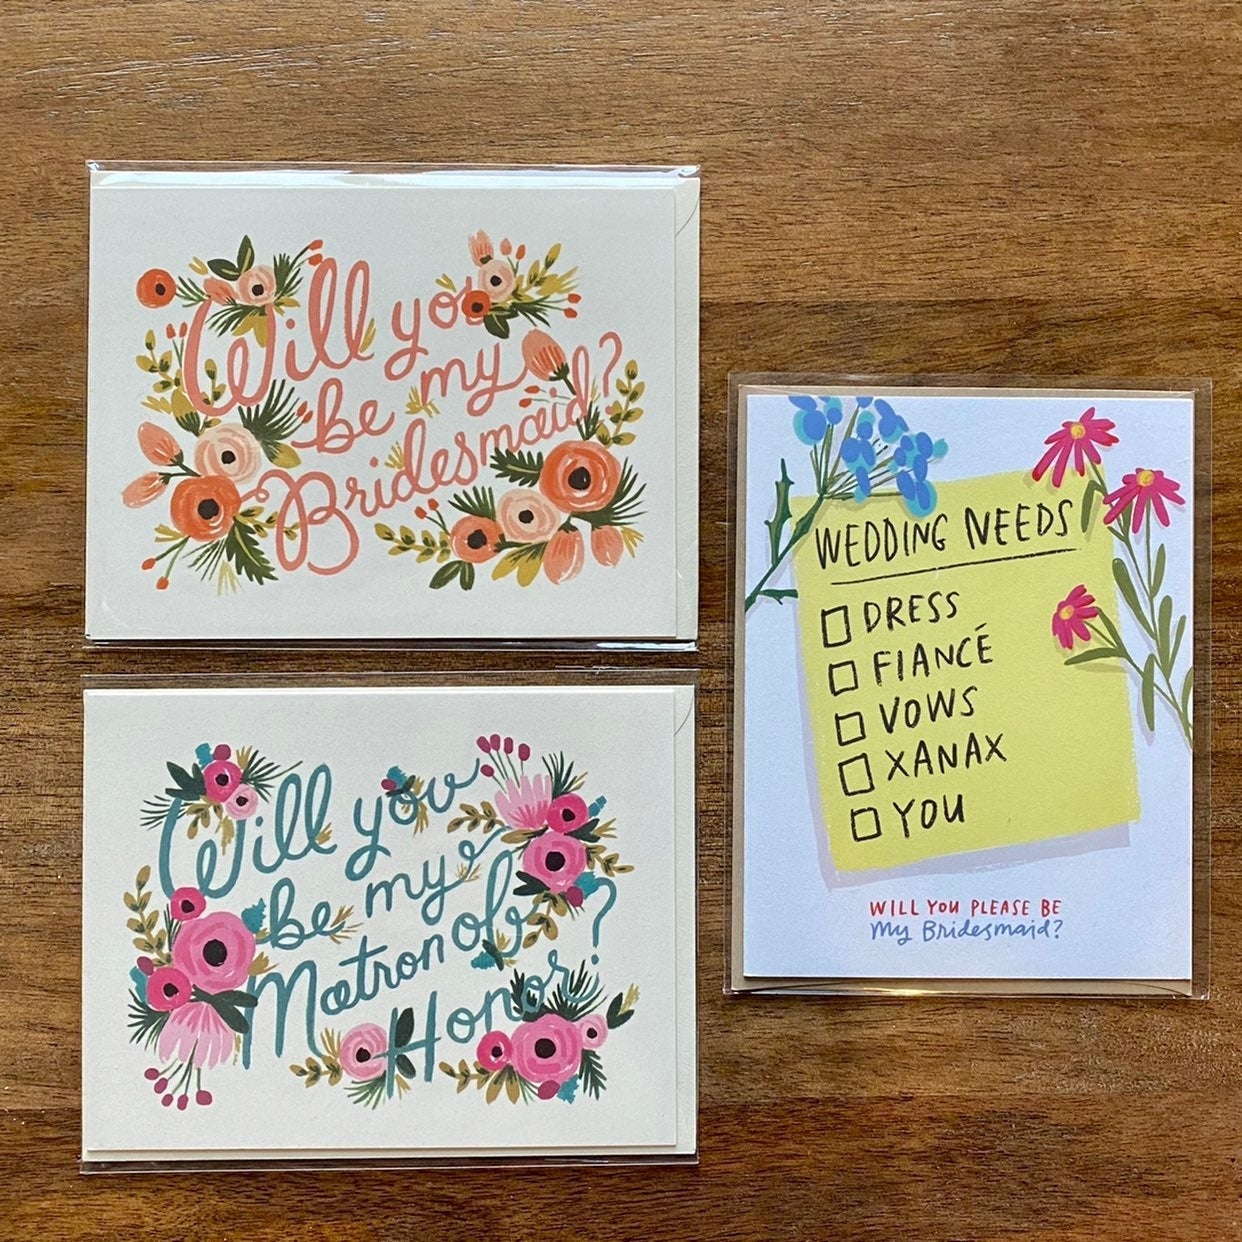 Greeting Cards (bridesmaids)